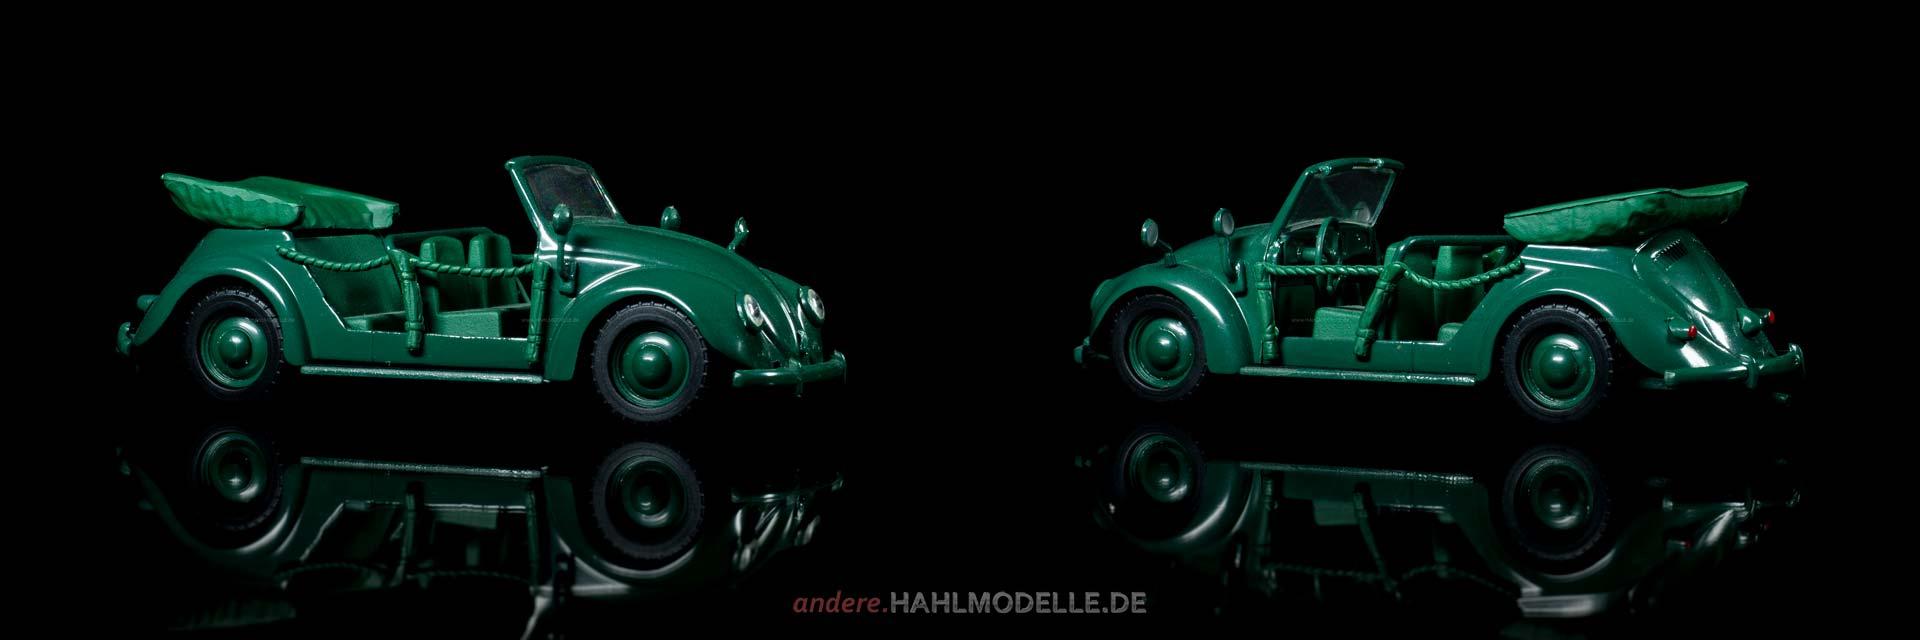 Volkswagen Käfer | Cabriolet | Victoria | 1:43 | www.andere.hahlmodelle.de